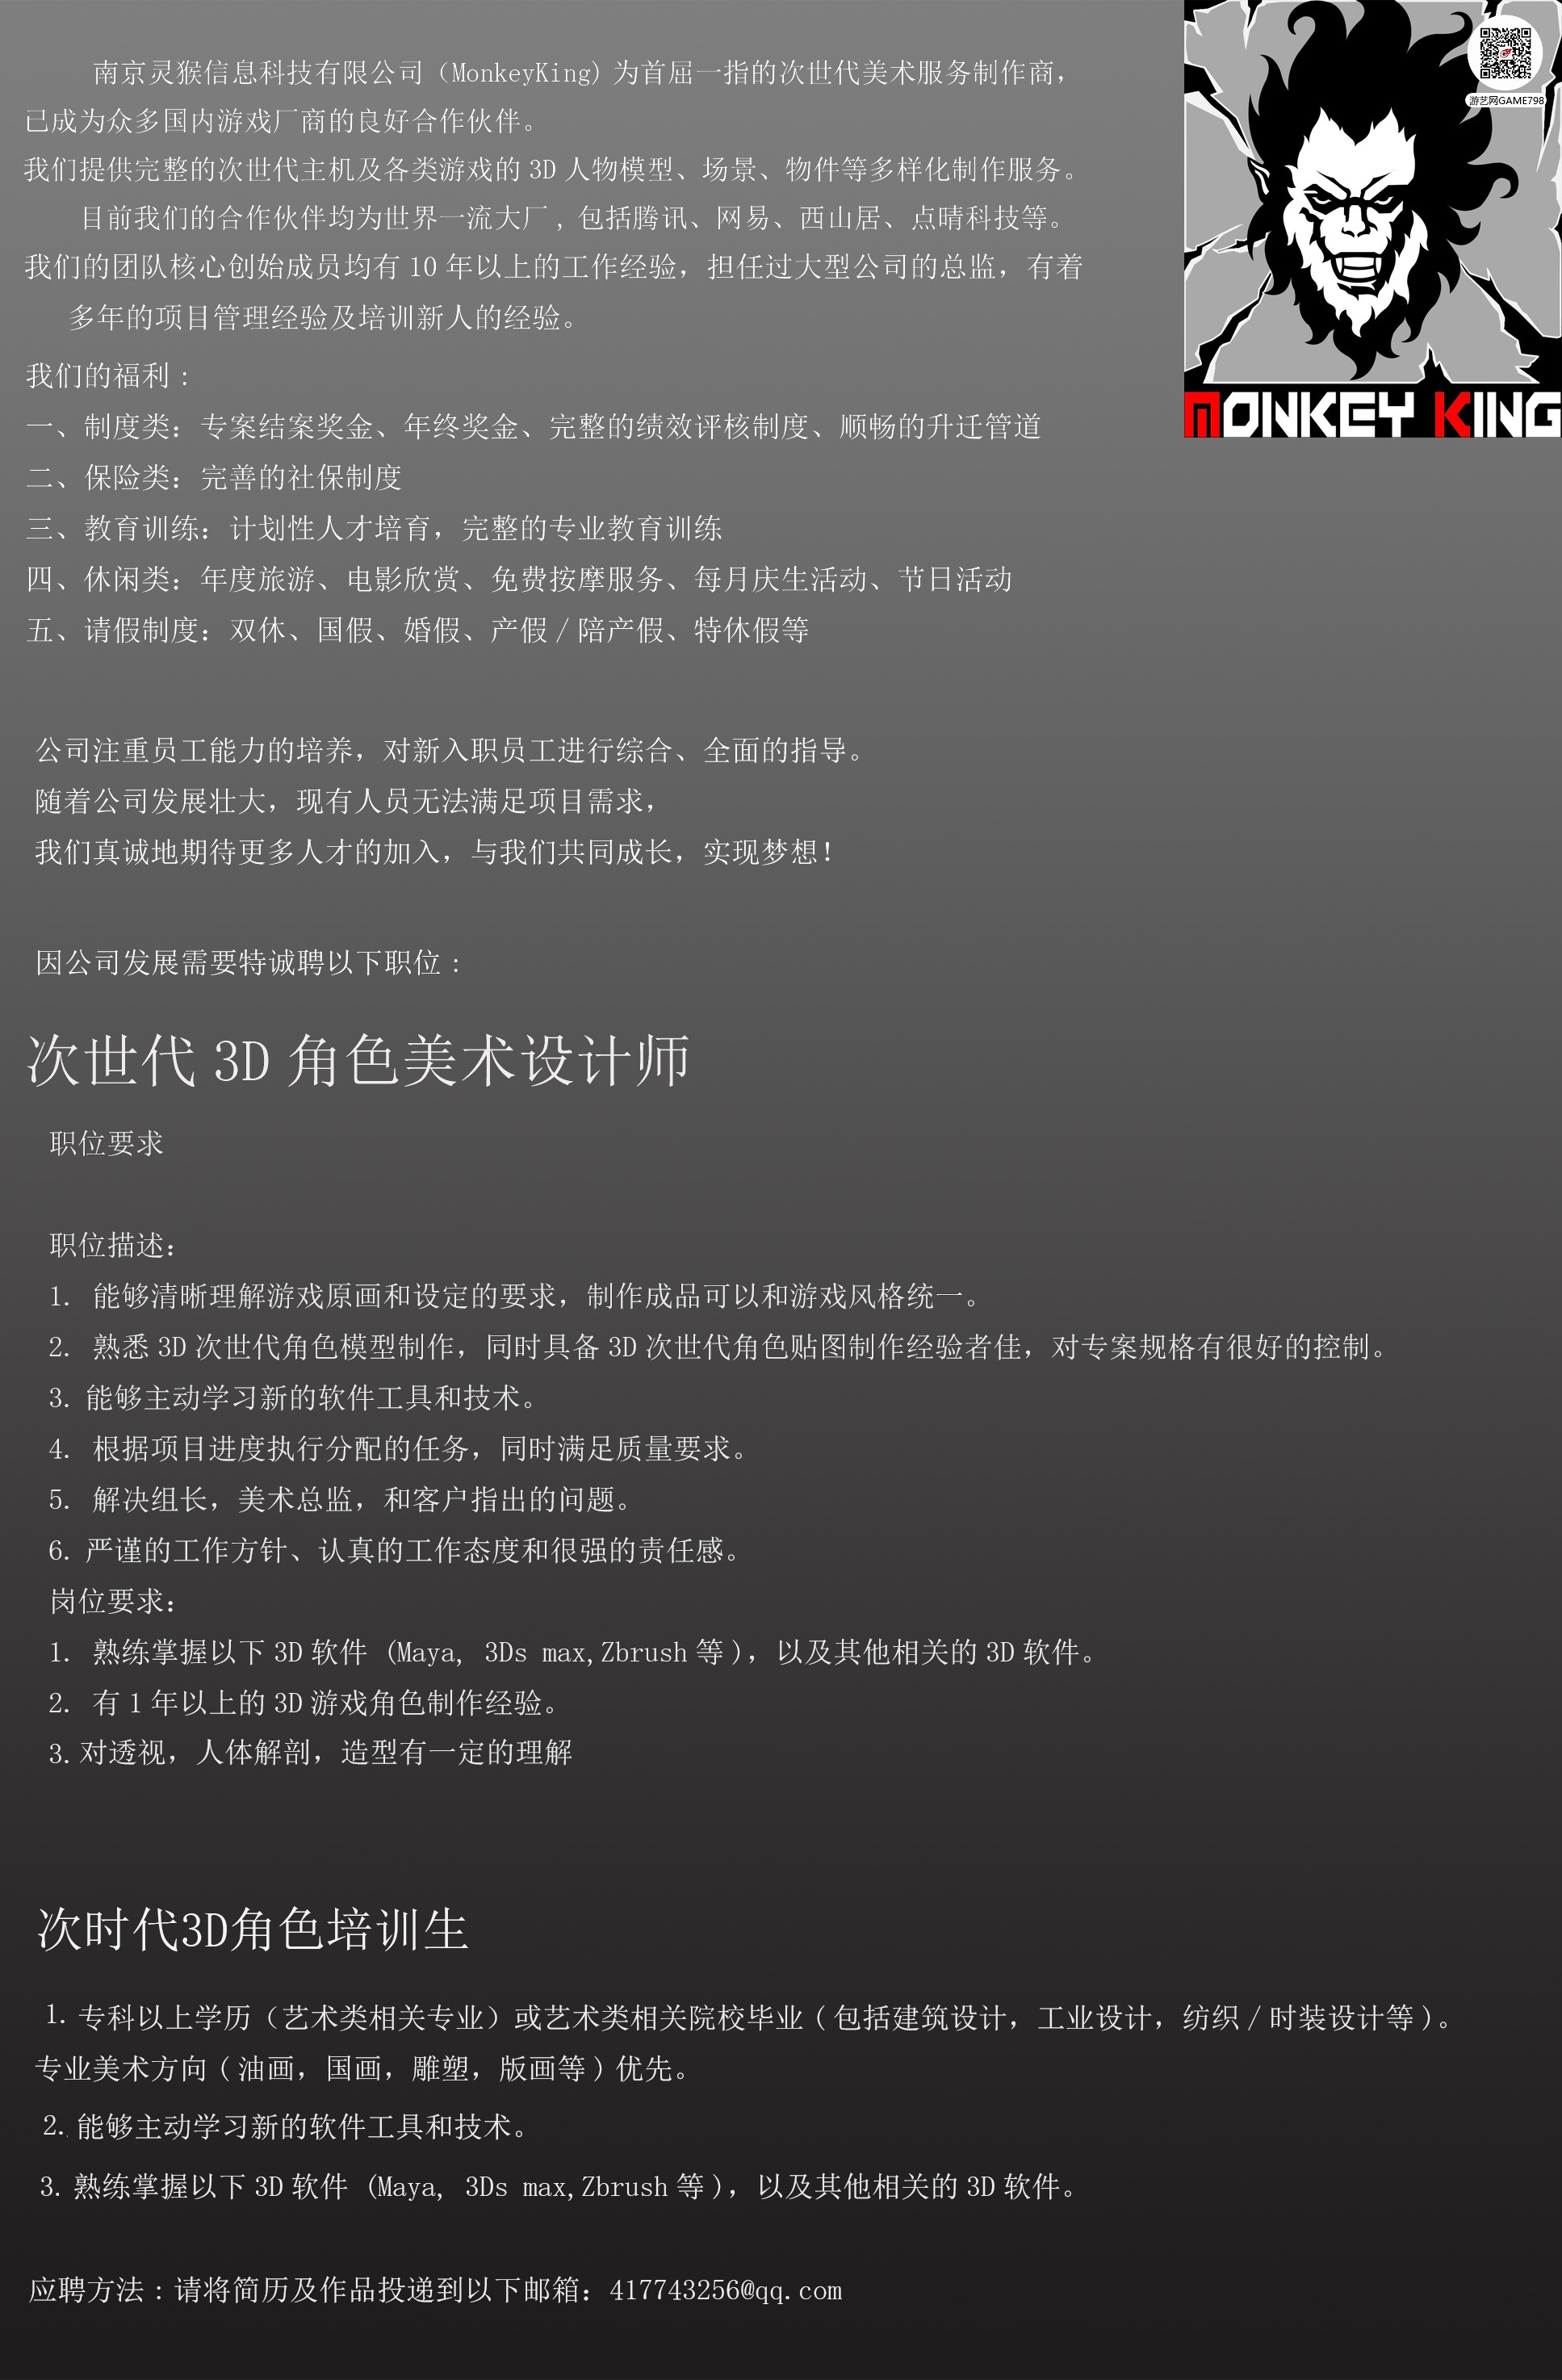 MKing_招聘简章.jpg